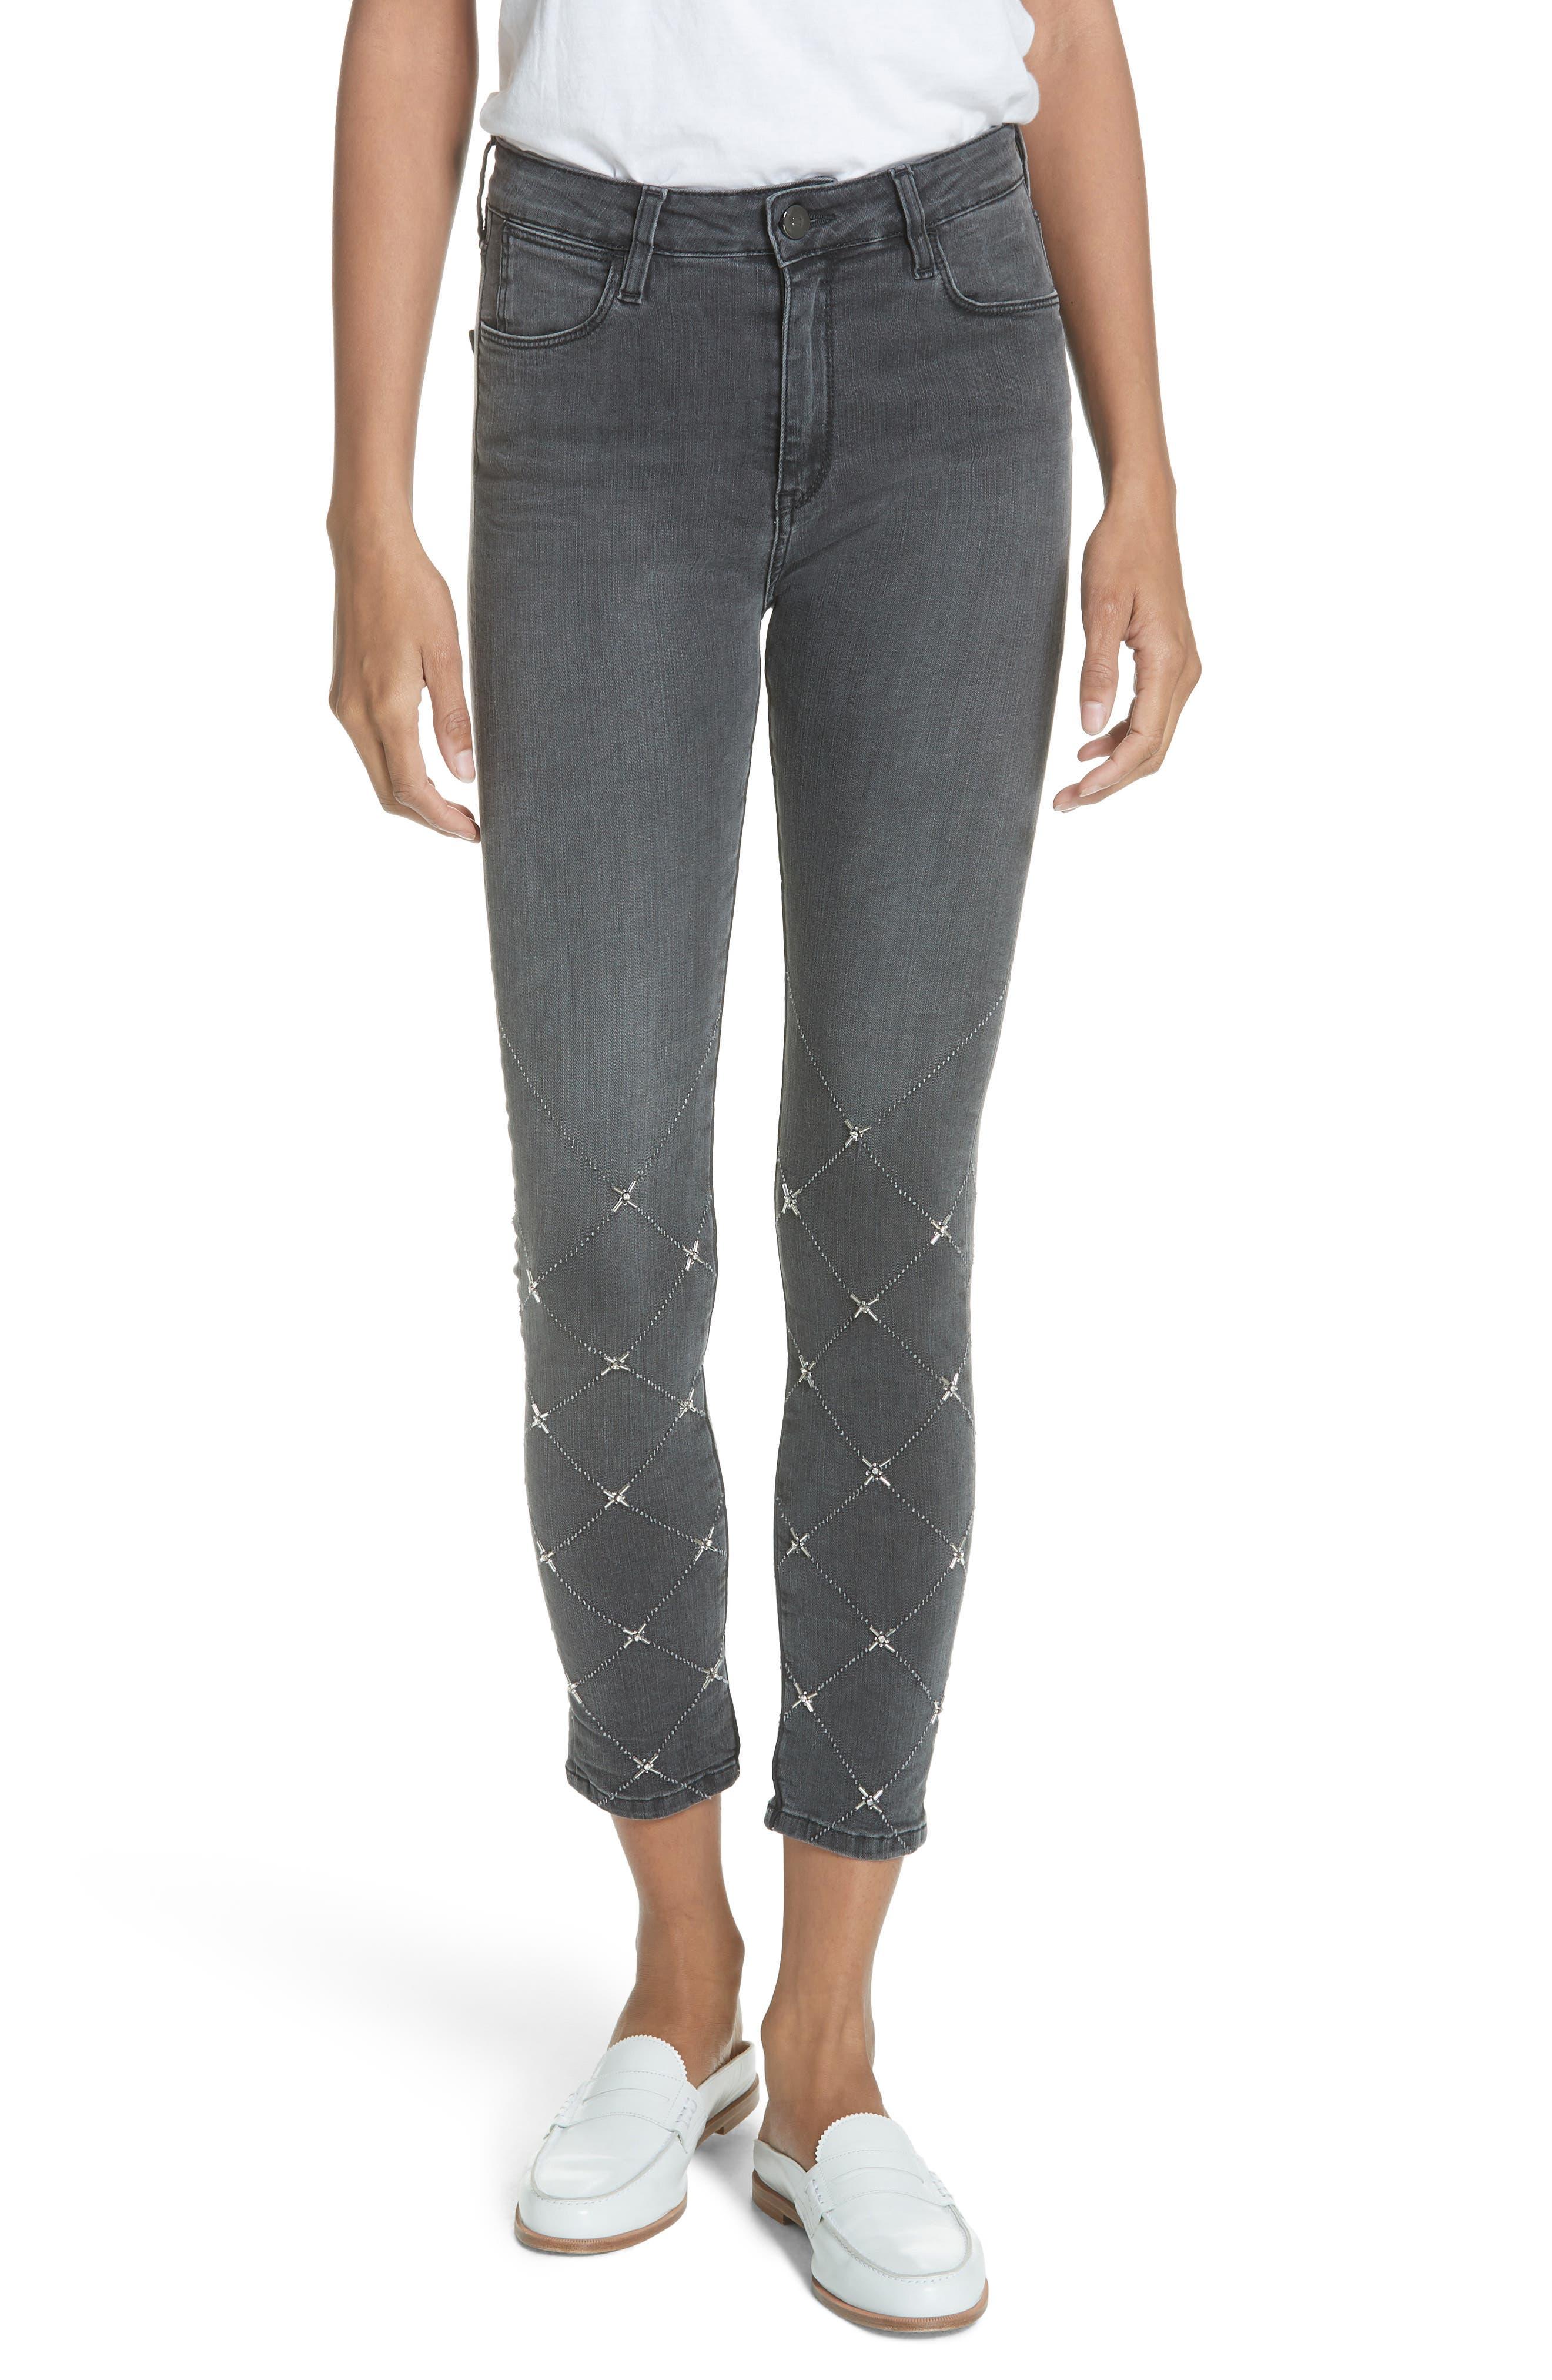 BROCKEN BOW Sakana Reina Embellished Ankle Skinny Jeans in Medium Grey